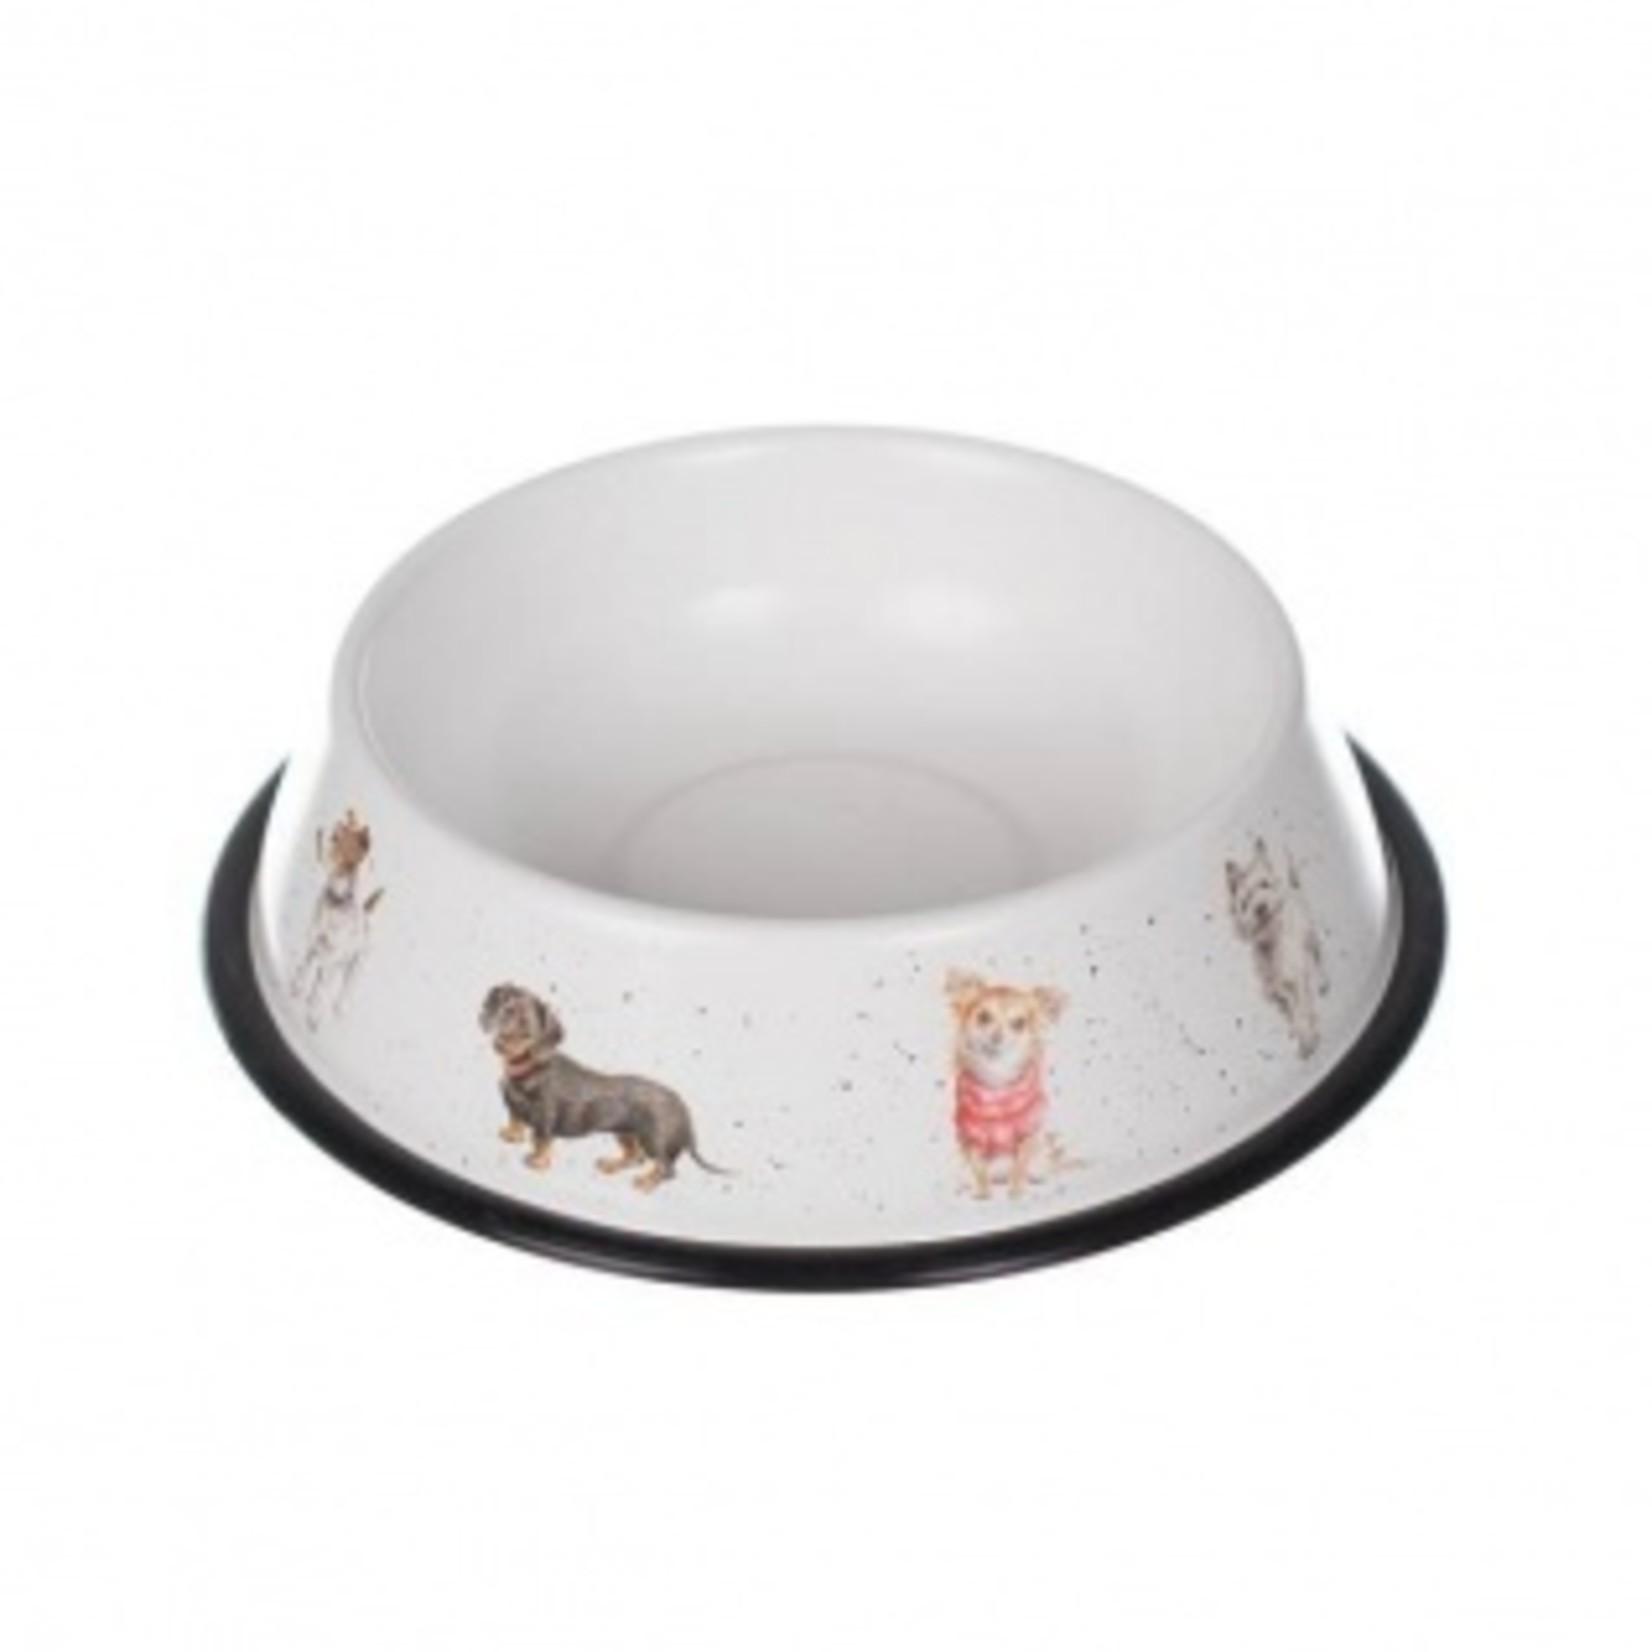 Talking Tables Dog Bowl